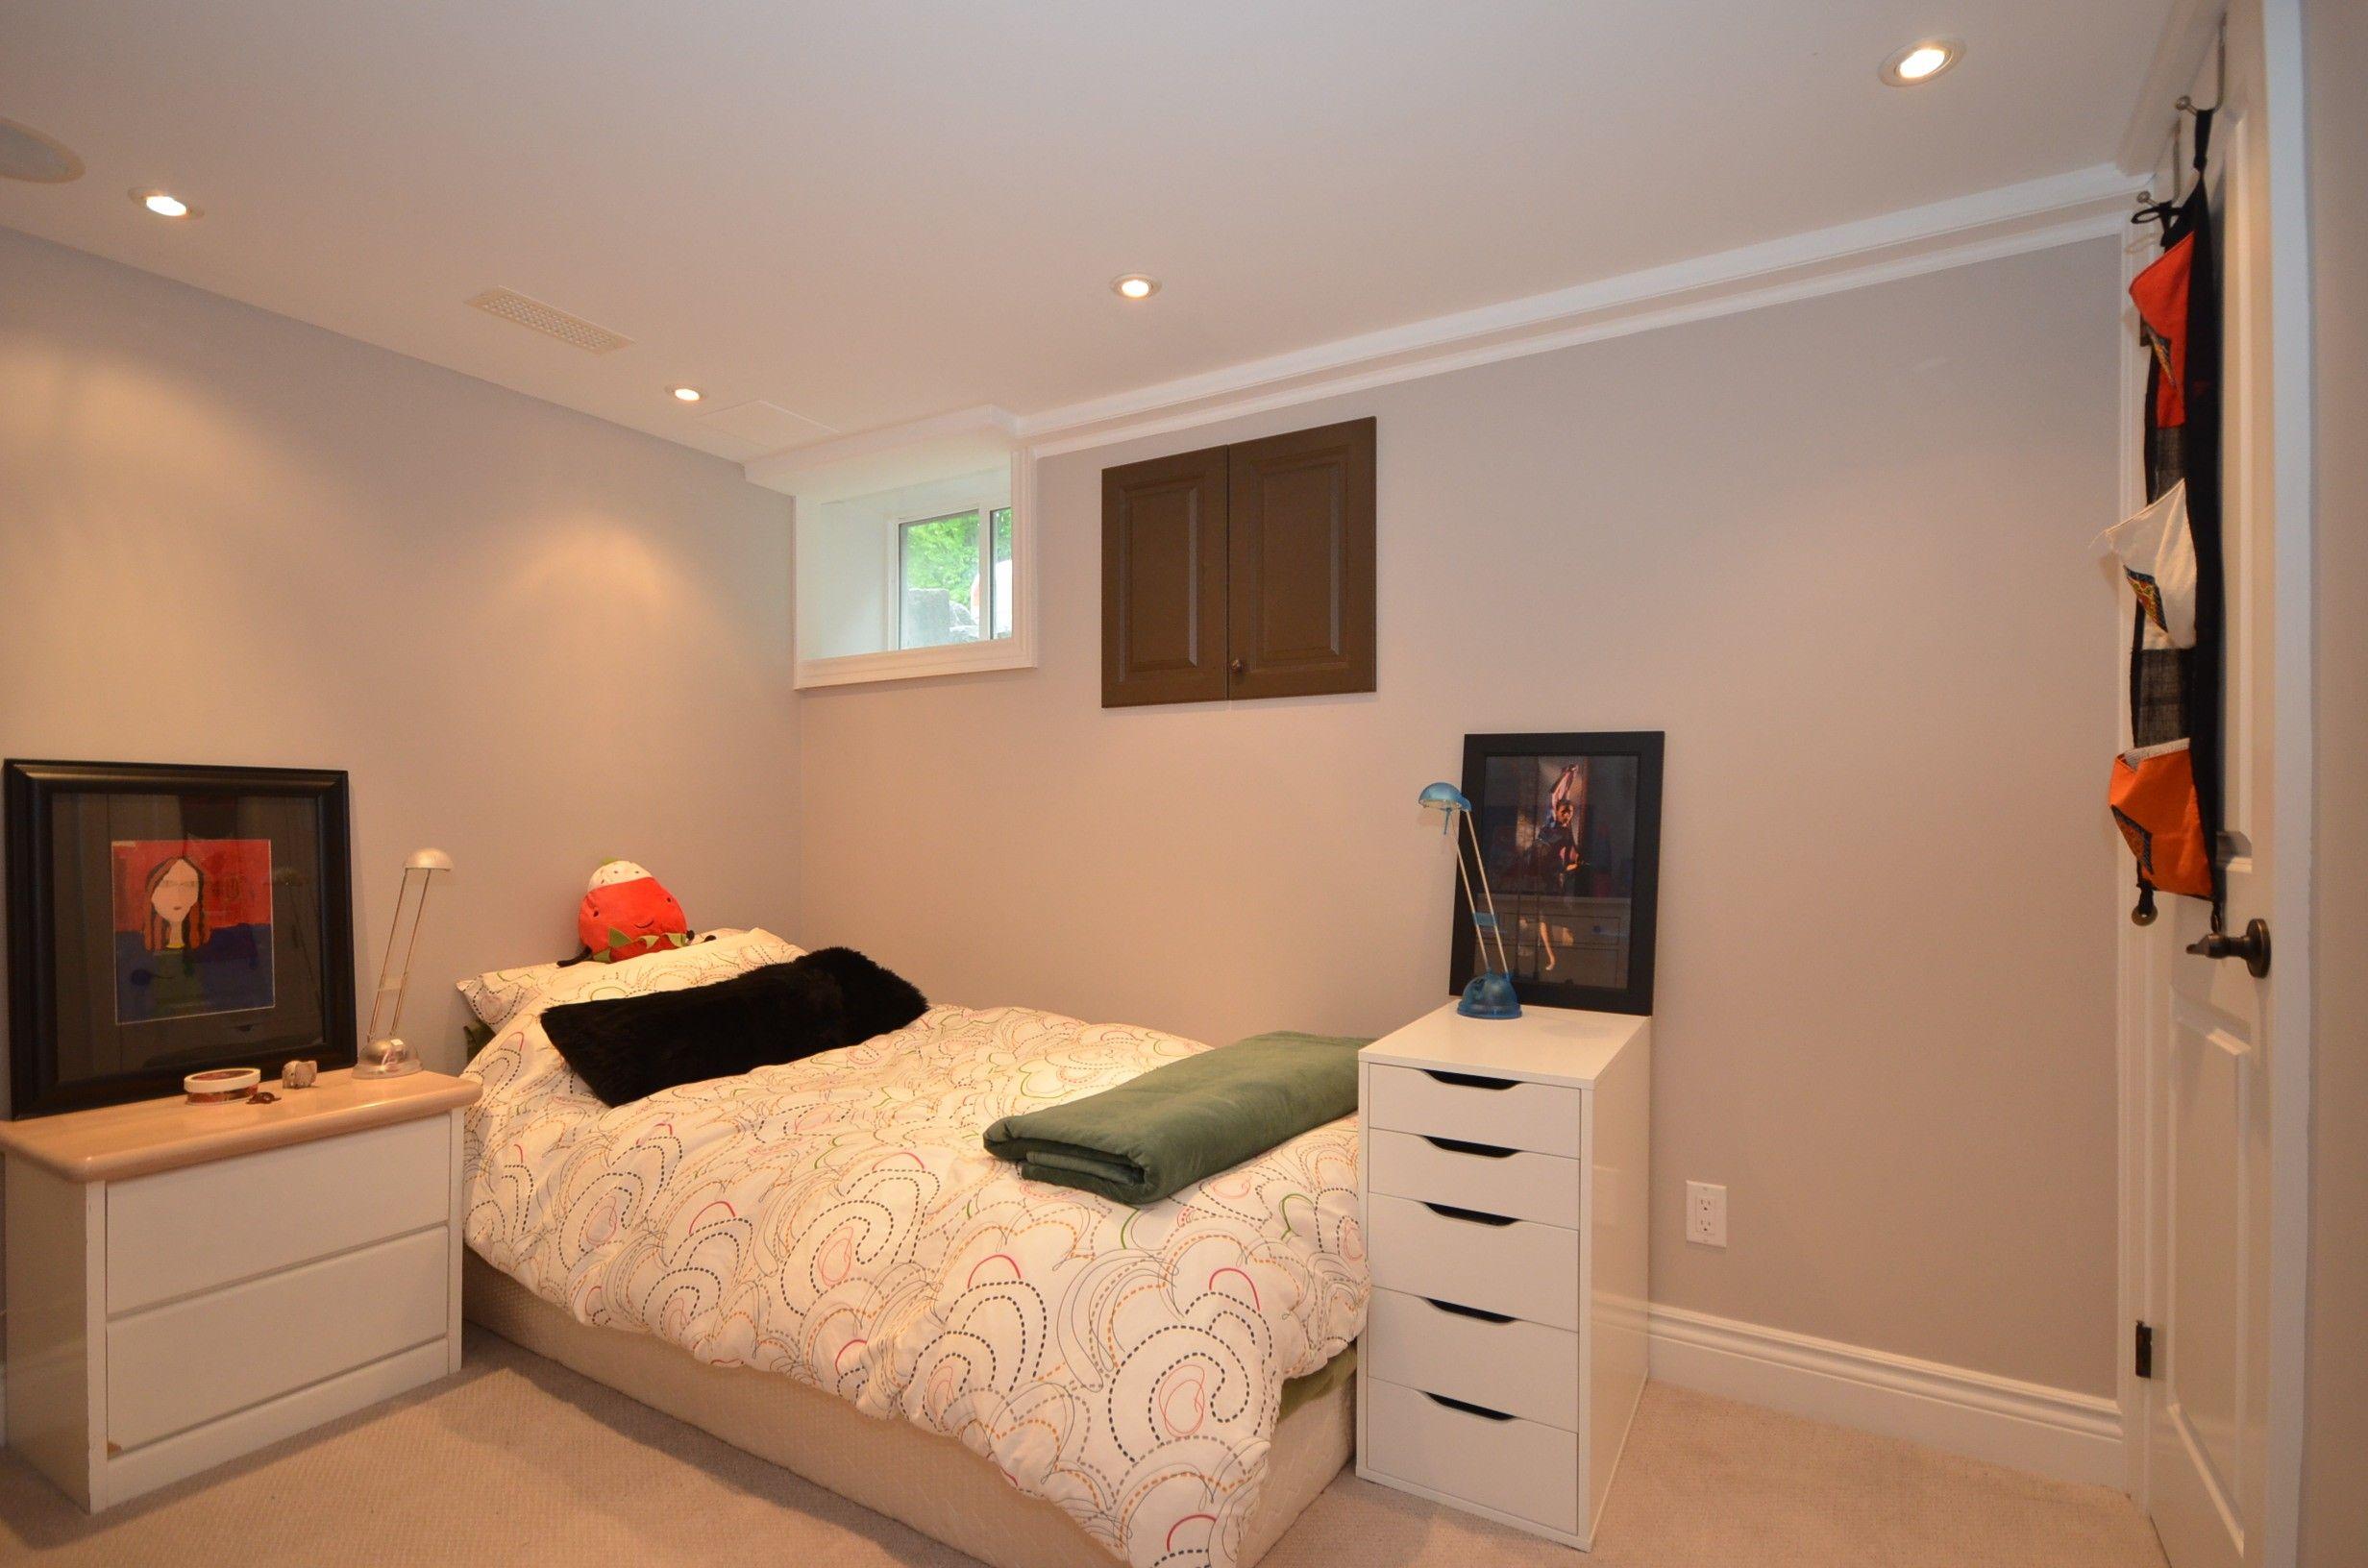 Superb Wonderful Small Basement Bedroom Ideas Fresh In Ideas Gallery Ideas    Extraordinary Bedroom Ideas.